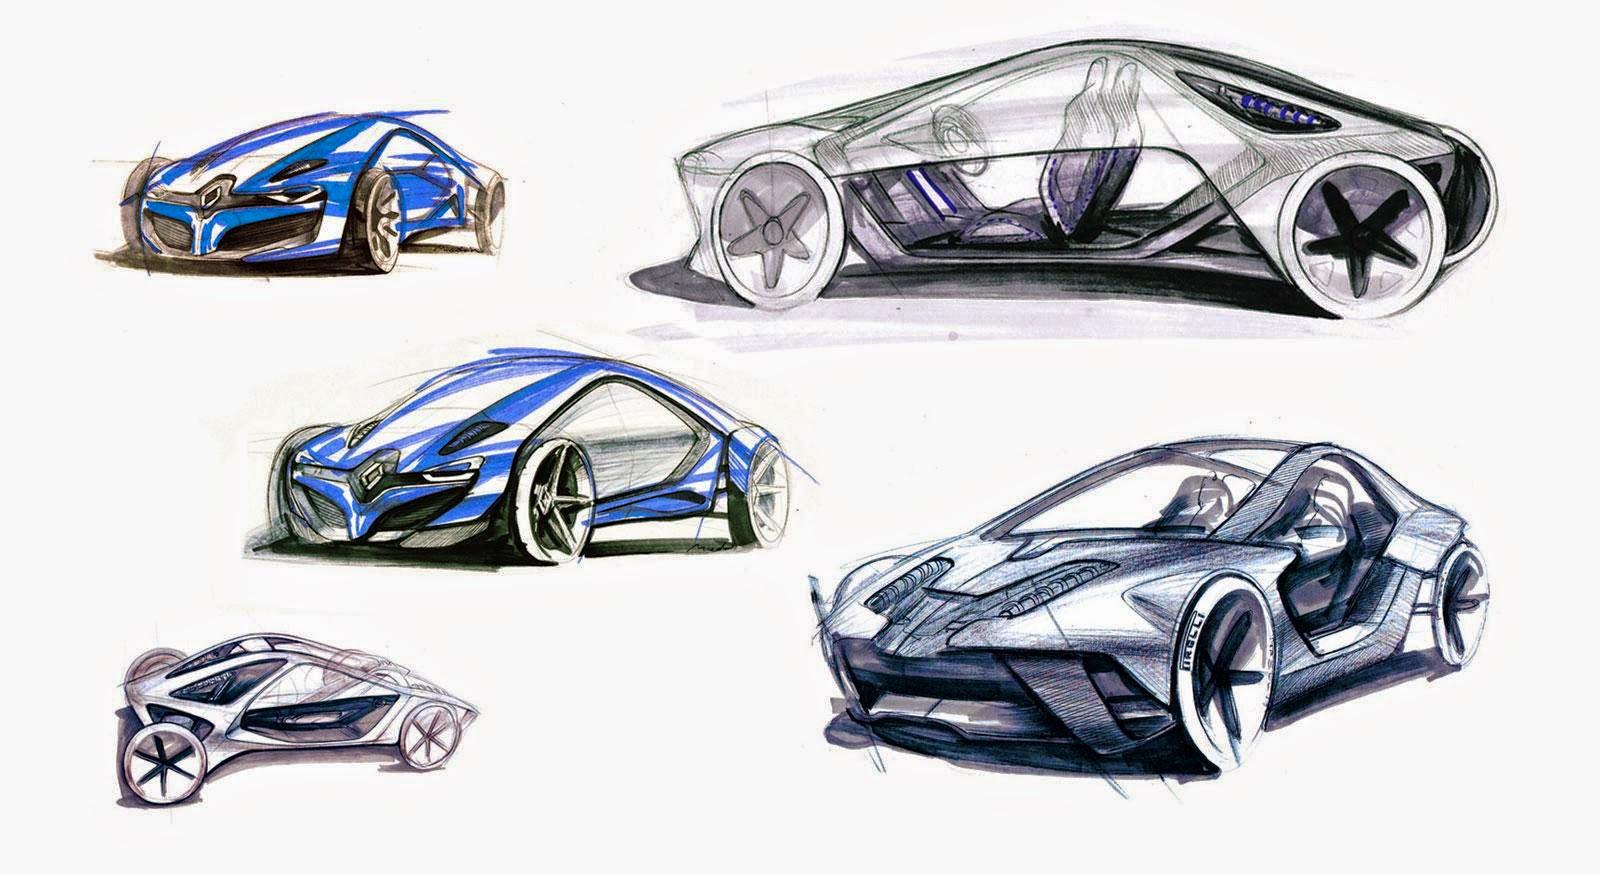 Car Body Design: Car Body Designing